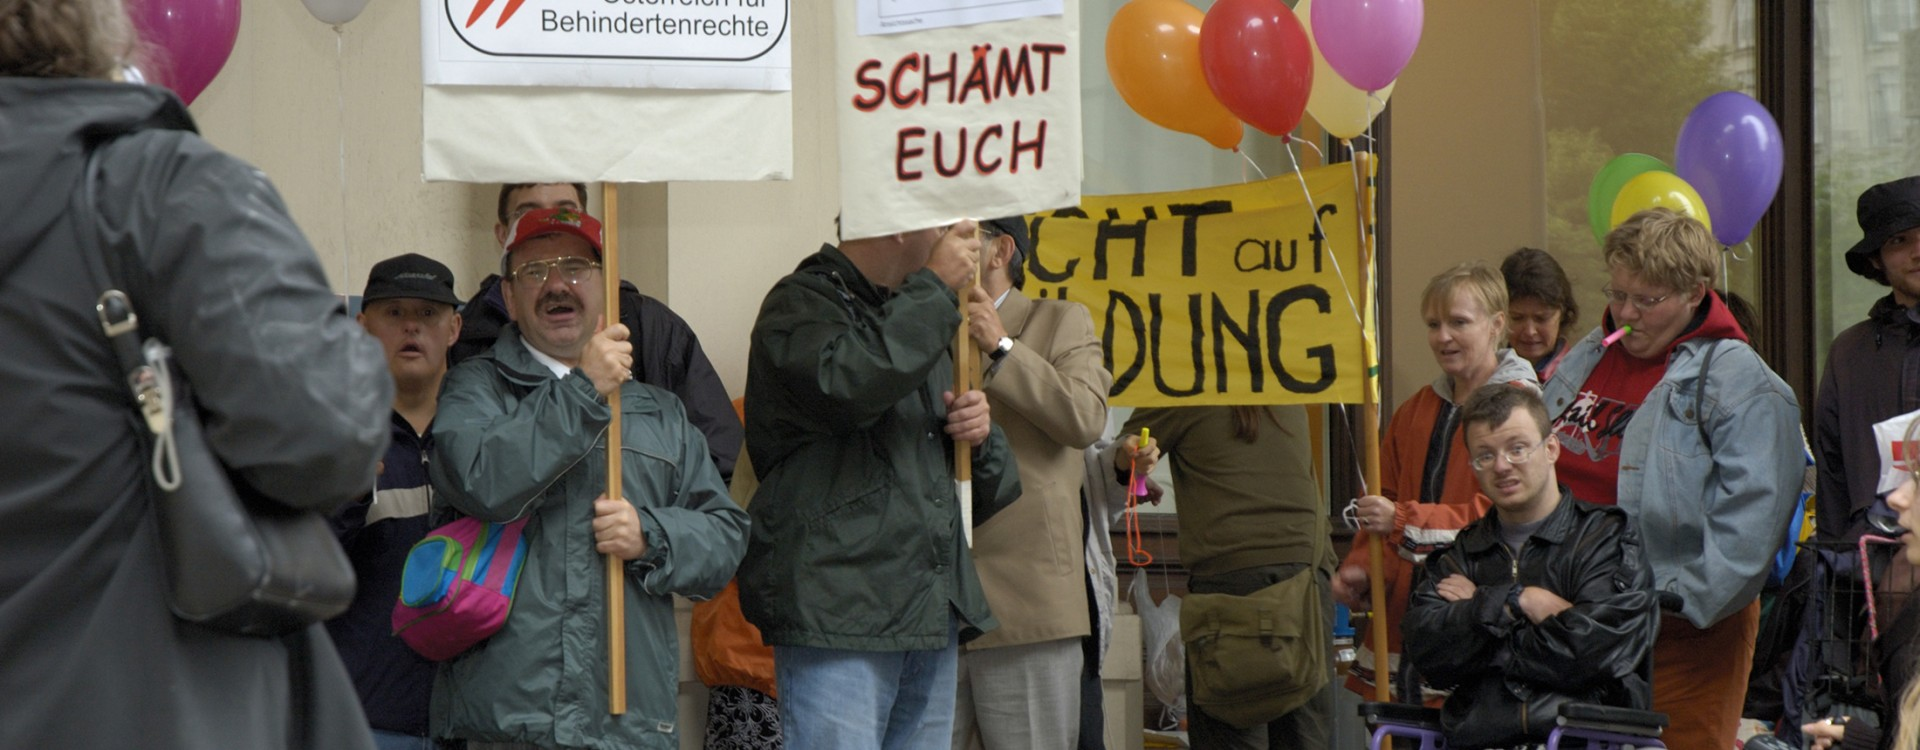 Mahnwache vor der ÖVP-Zentrale 050705